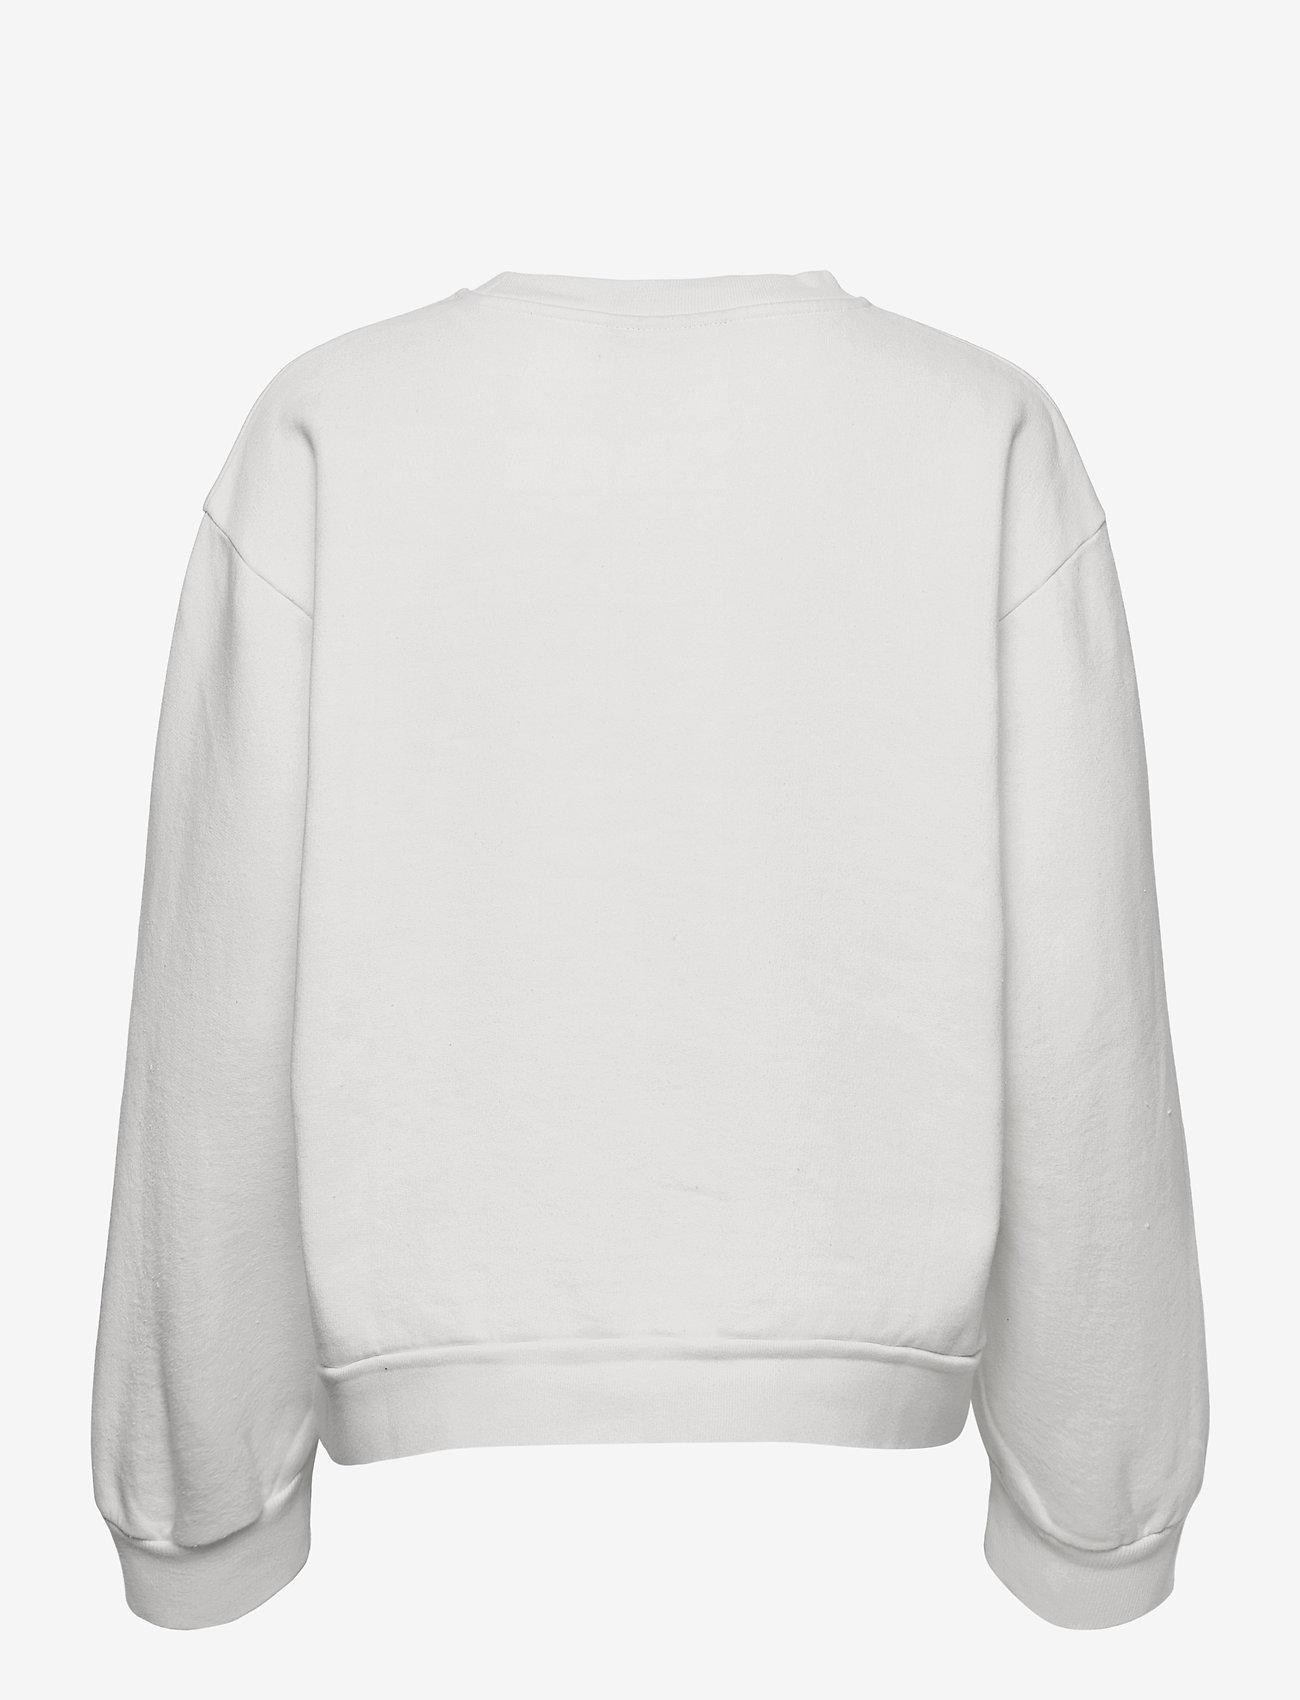 HAN Kjøbenhavn - Bulky Crew - sweatshirts - off white - 1